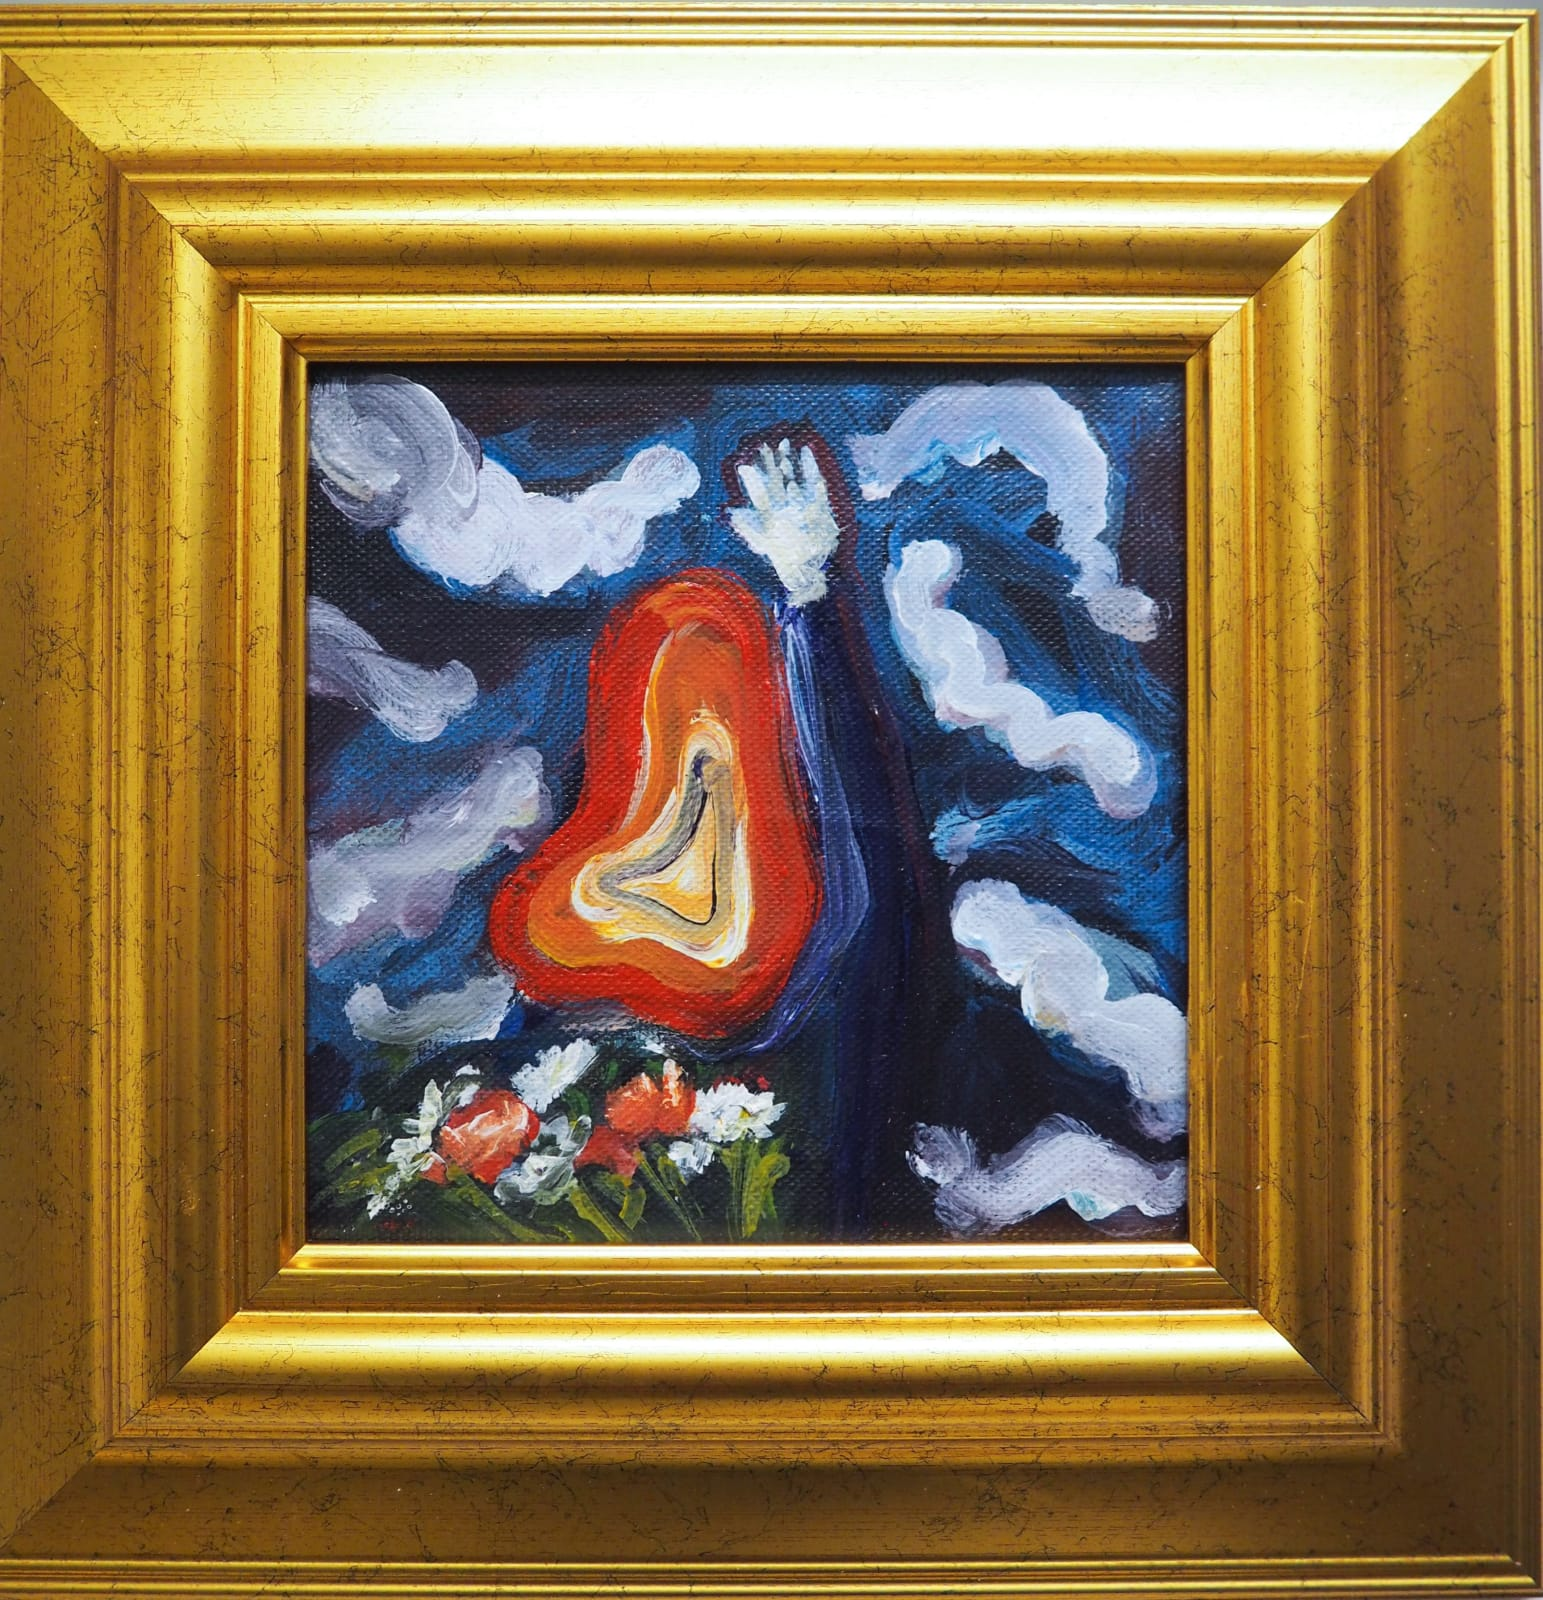 Yassine Balbzioui, the winner is, 2018 Oil on canvas 35.2 x 35.2 cm